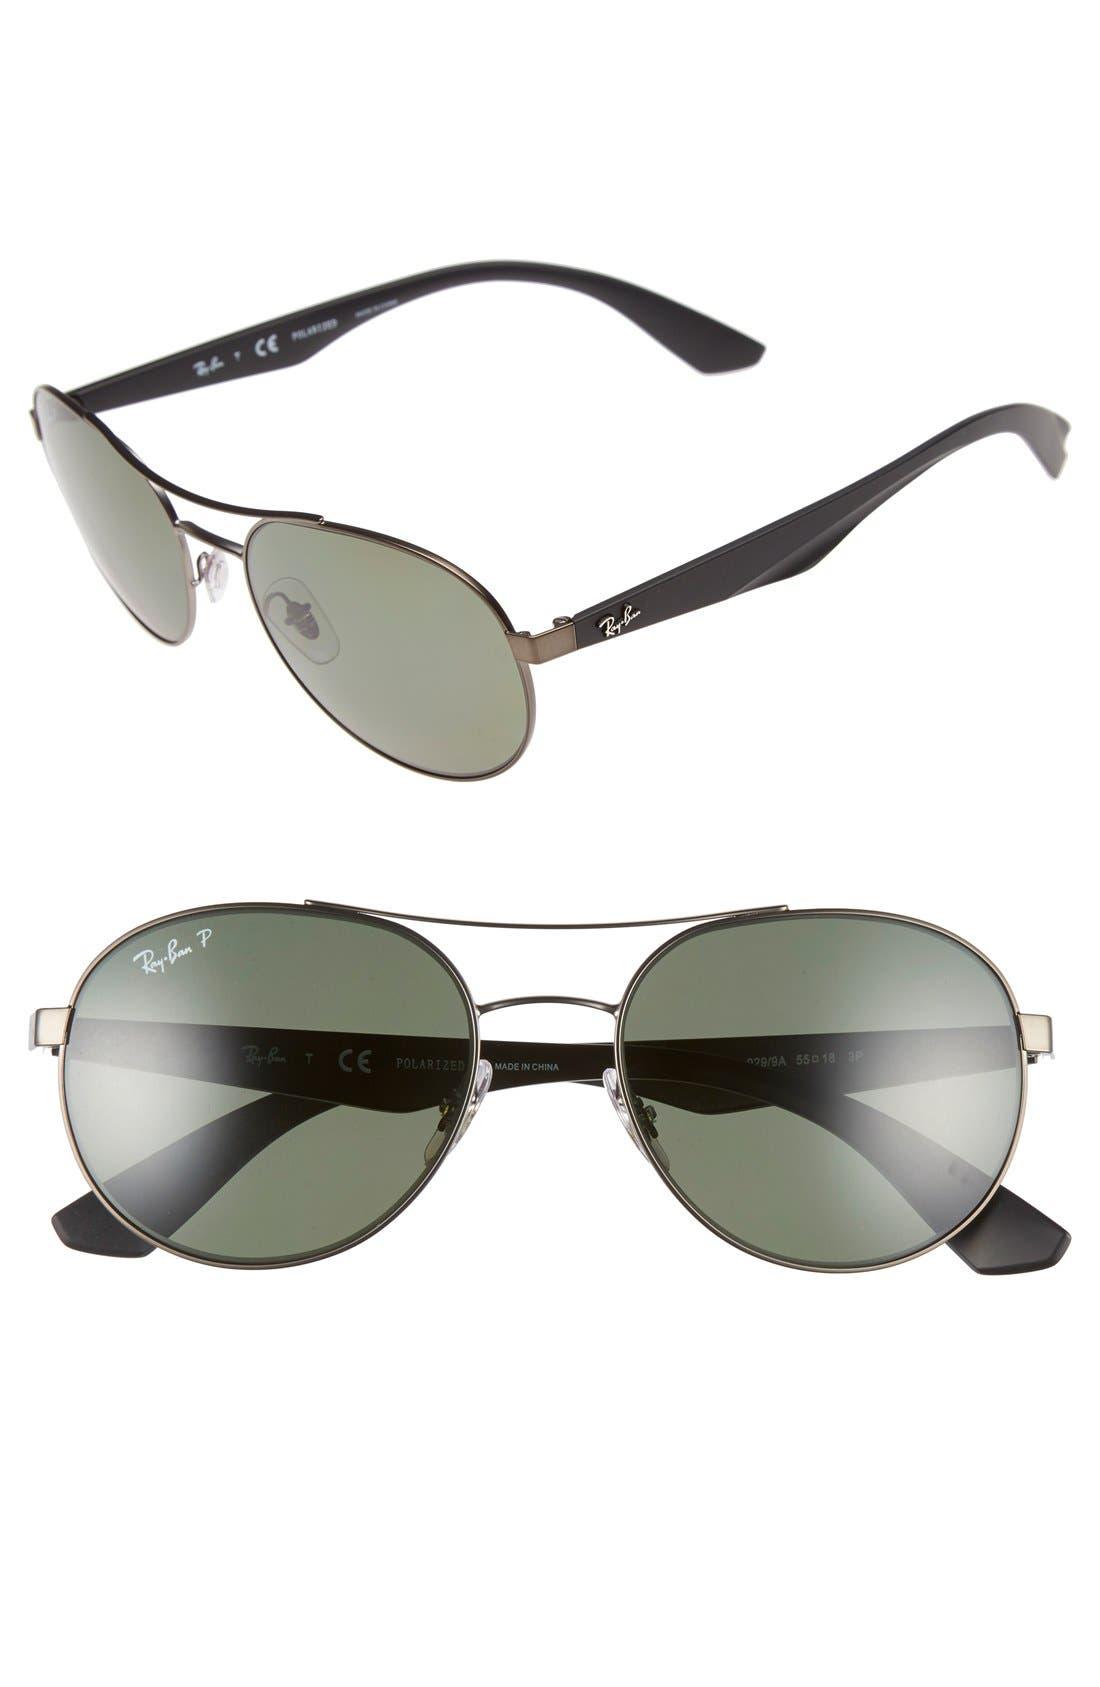 Main Image - Ray-Ban 55mm Polarized Sunglasses